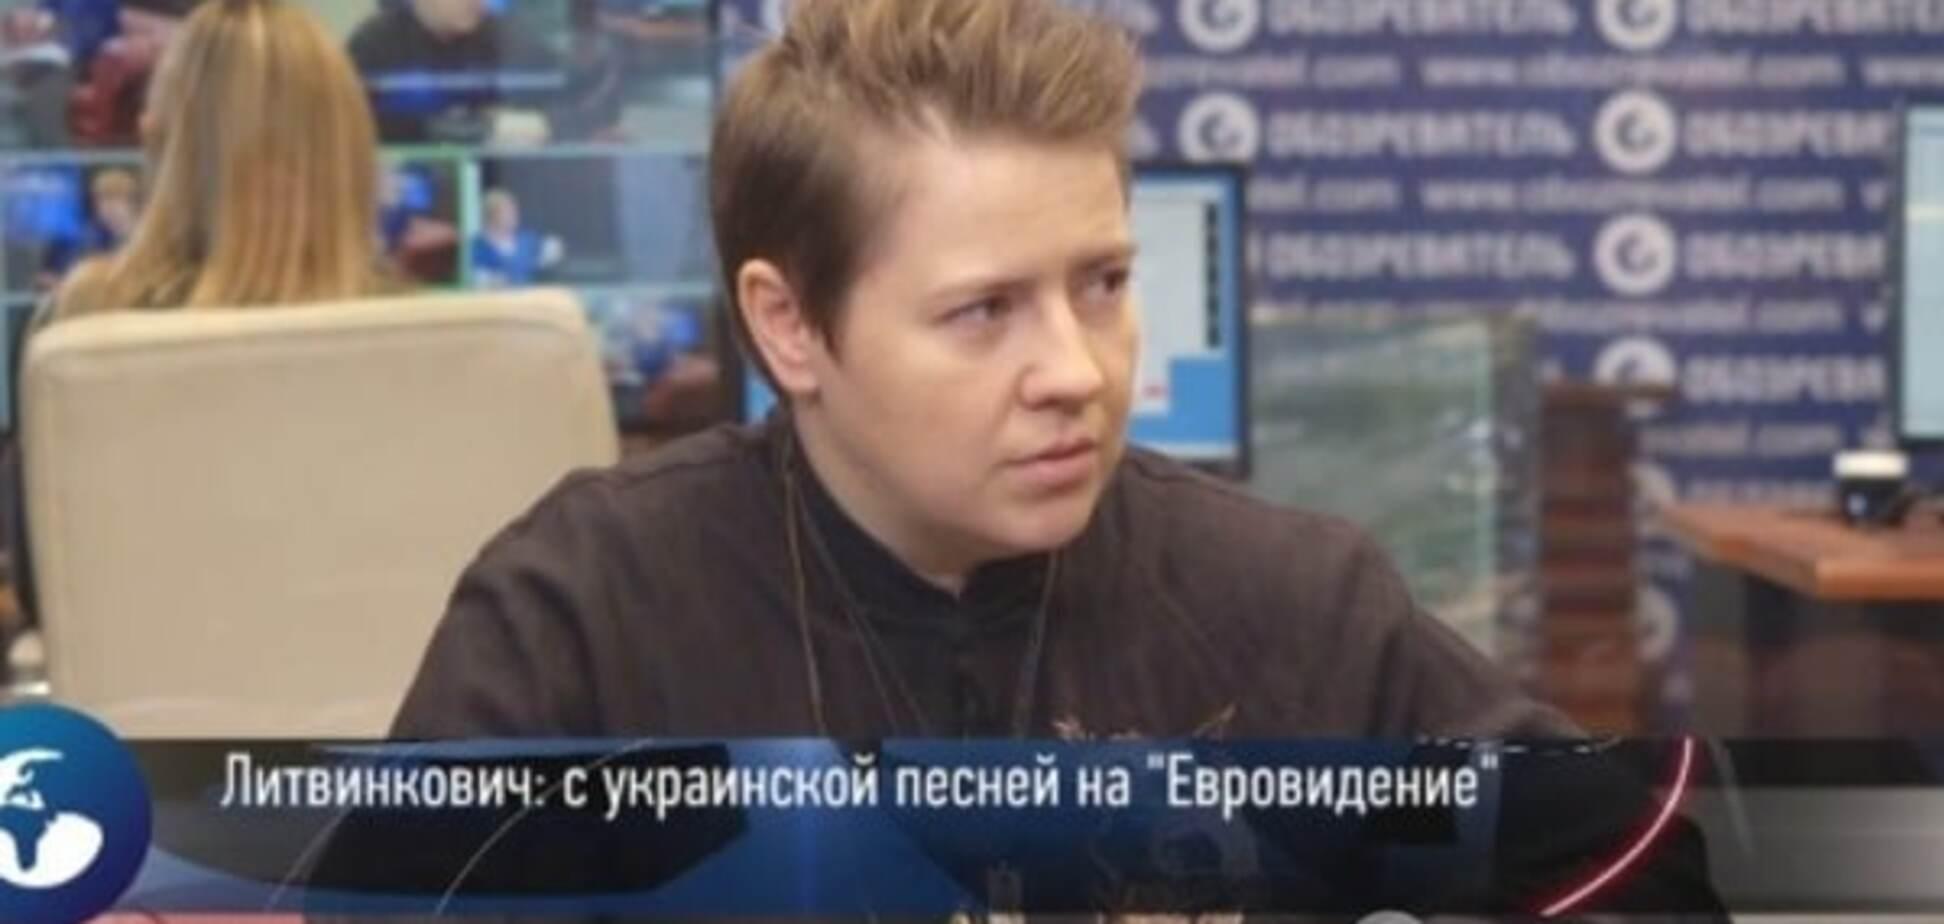 Евгений Литвинкович